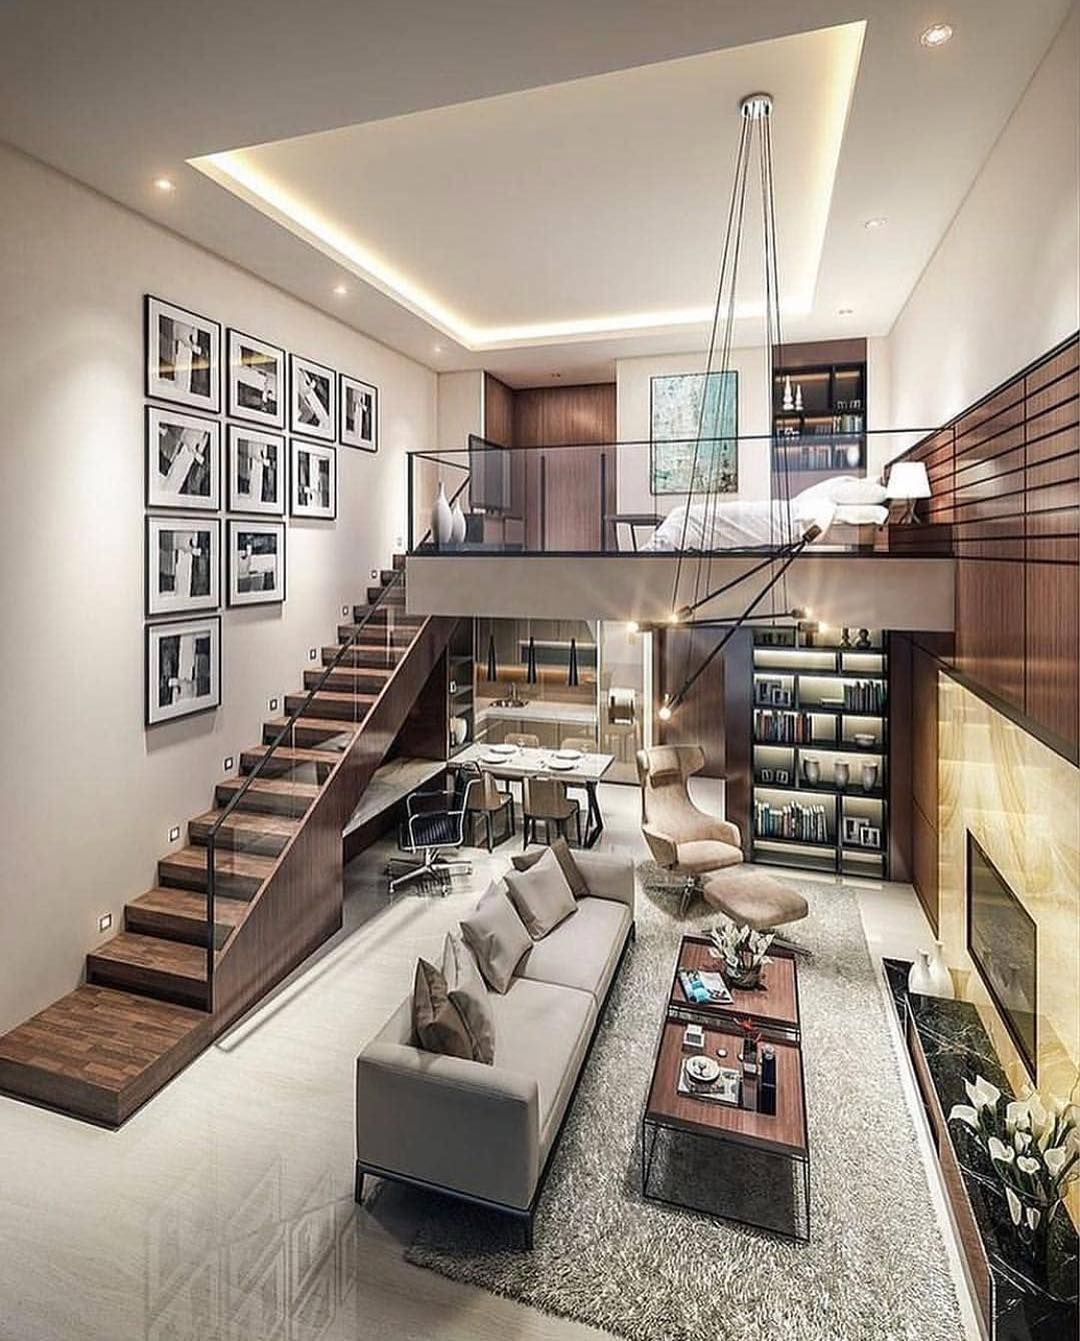 60 Home Decor Store Name Ideas Ideas Design Interior Design Companies Best Interior Design